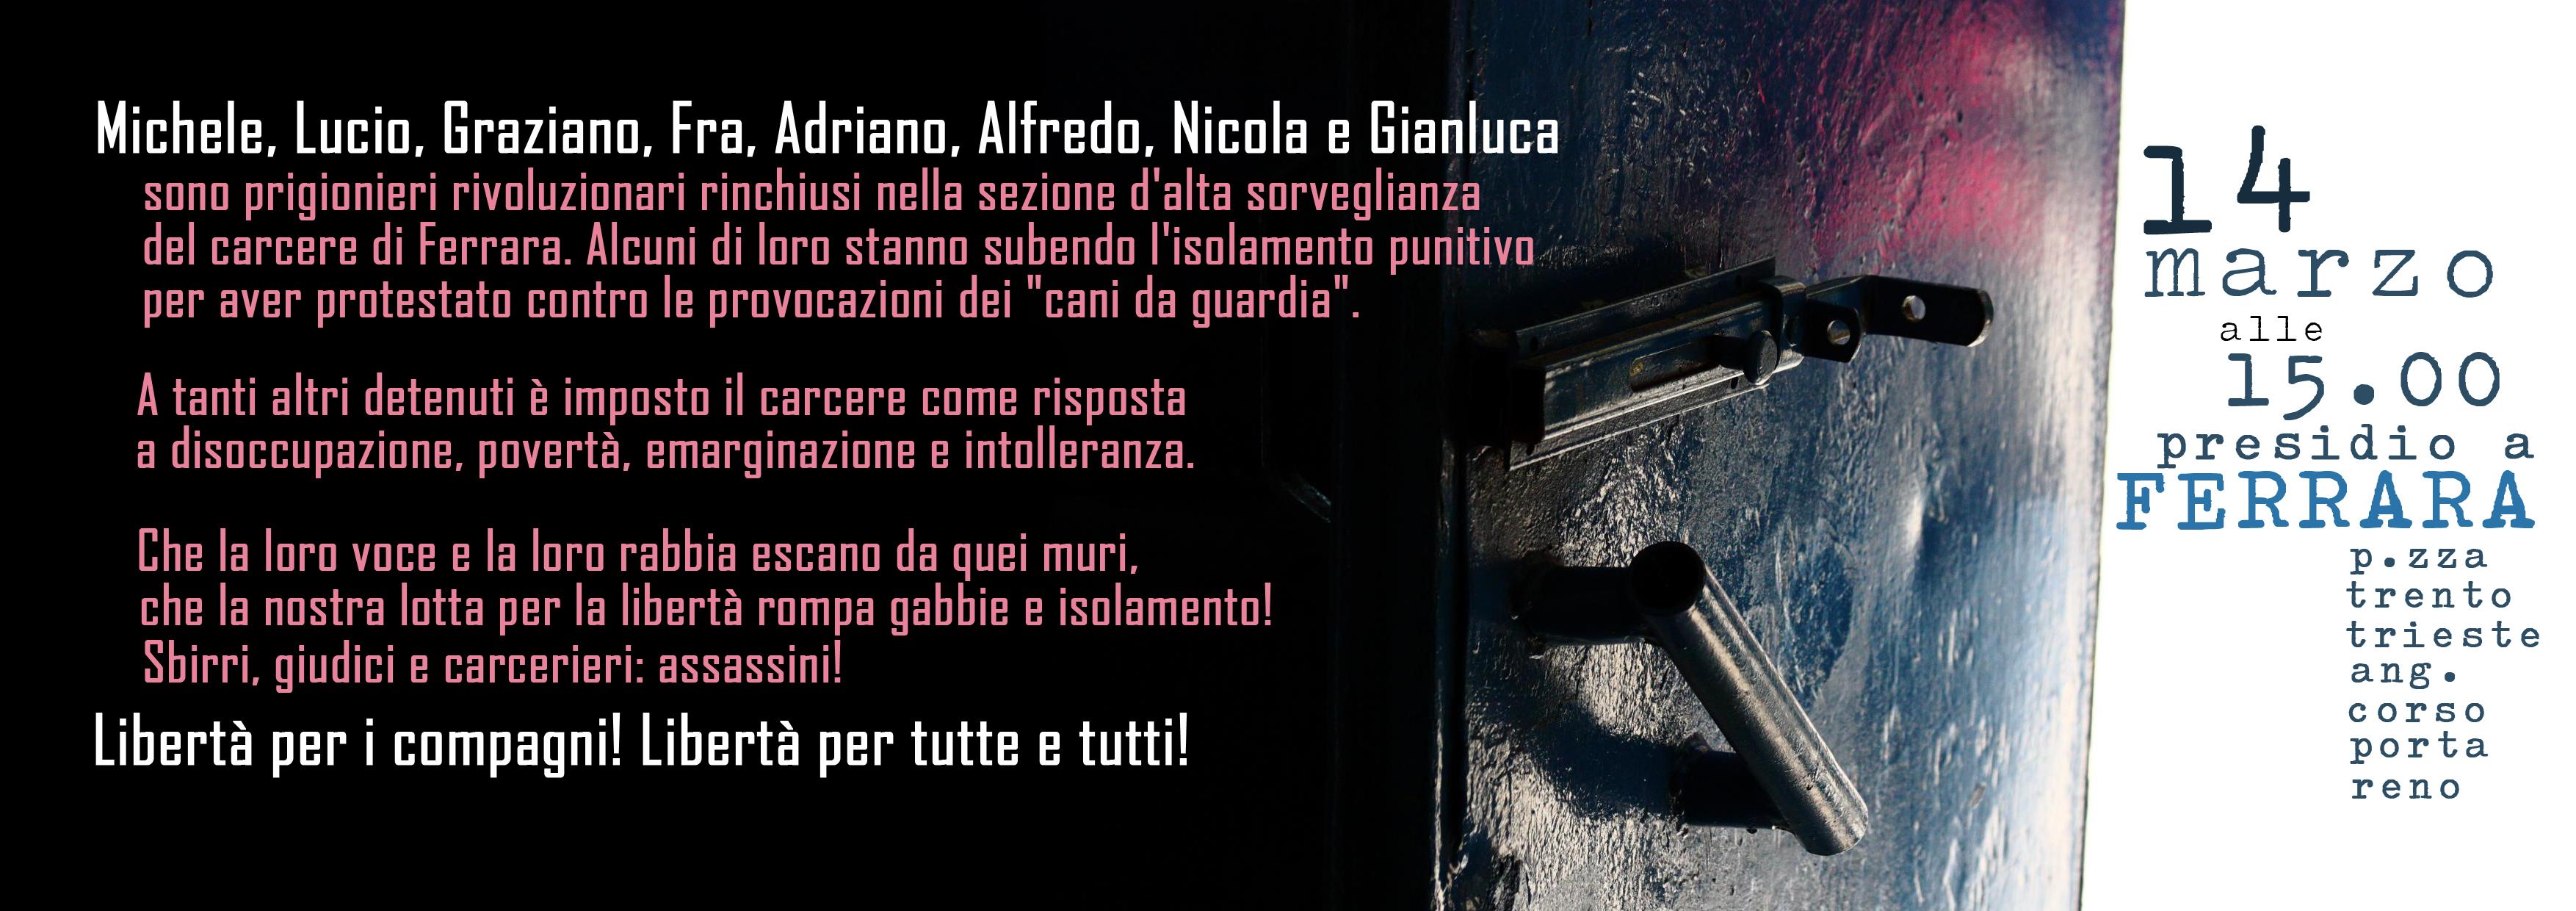 presidio Ferrara 14-03-2015